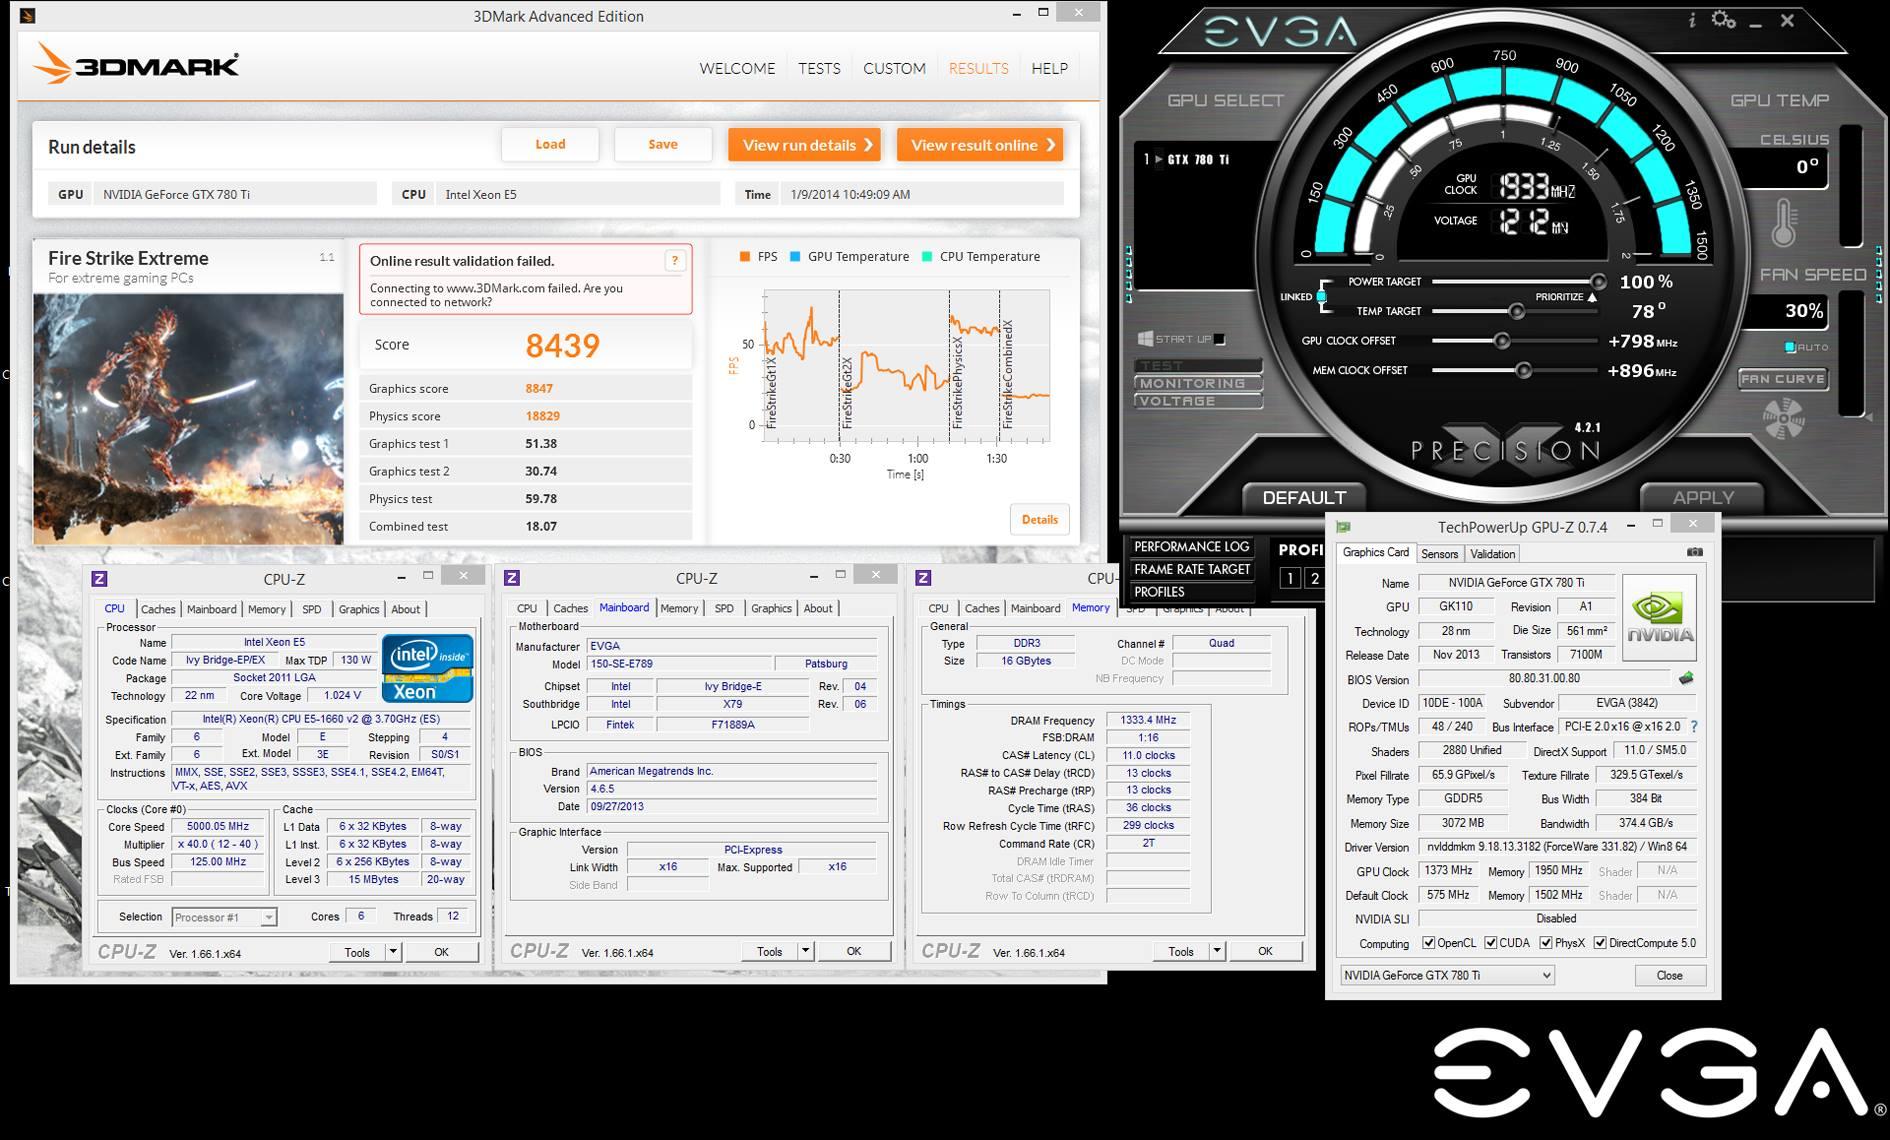 GeForce GTX 780 Ti overclockată la 1.9 GHz de K|NGP|N